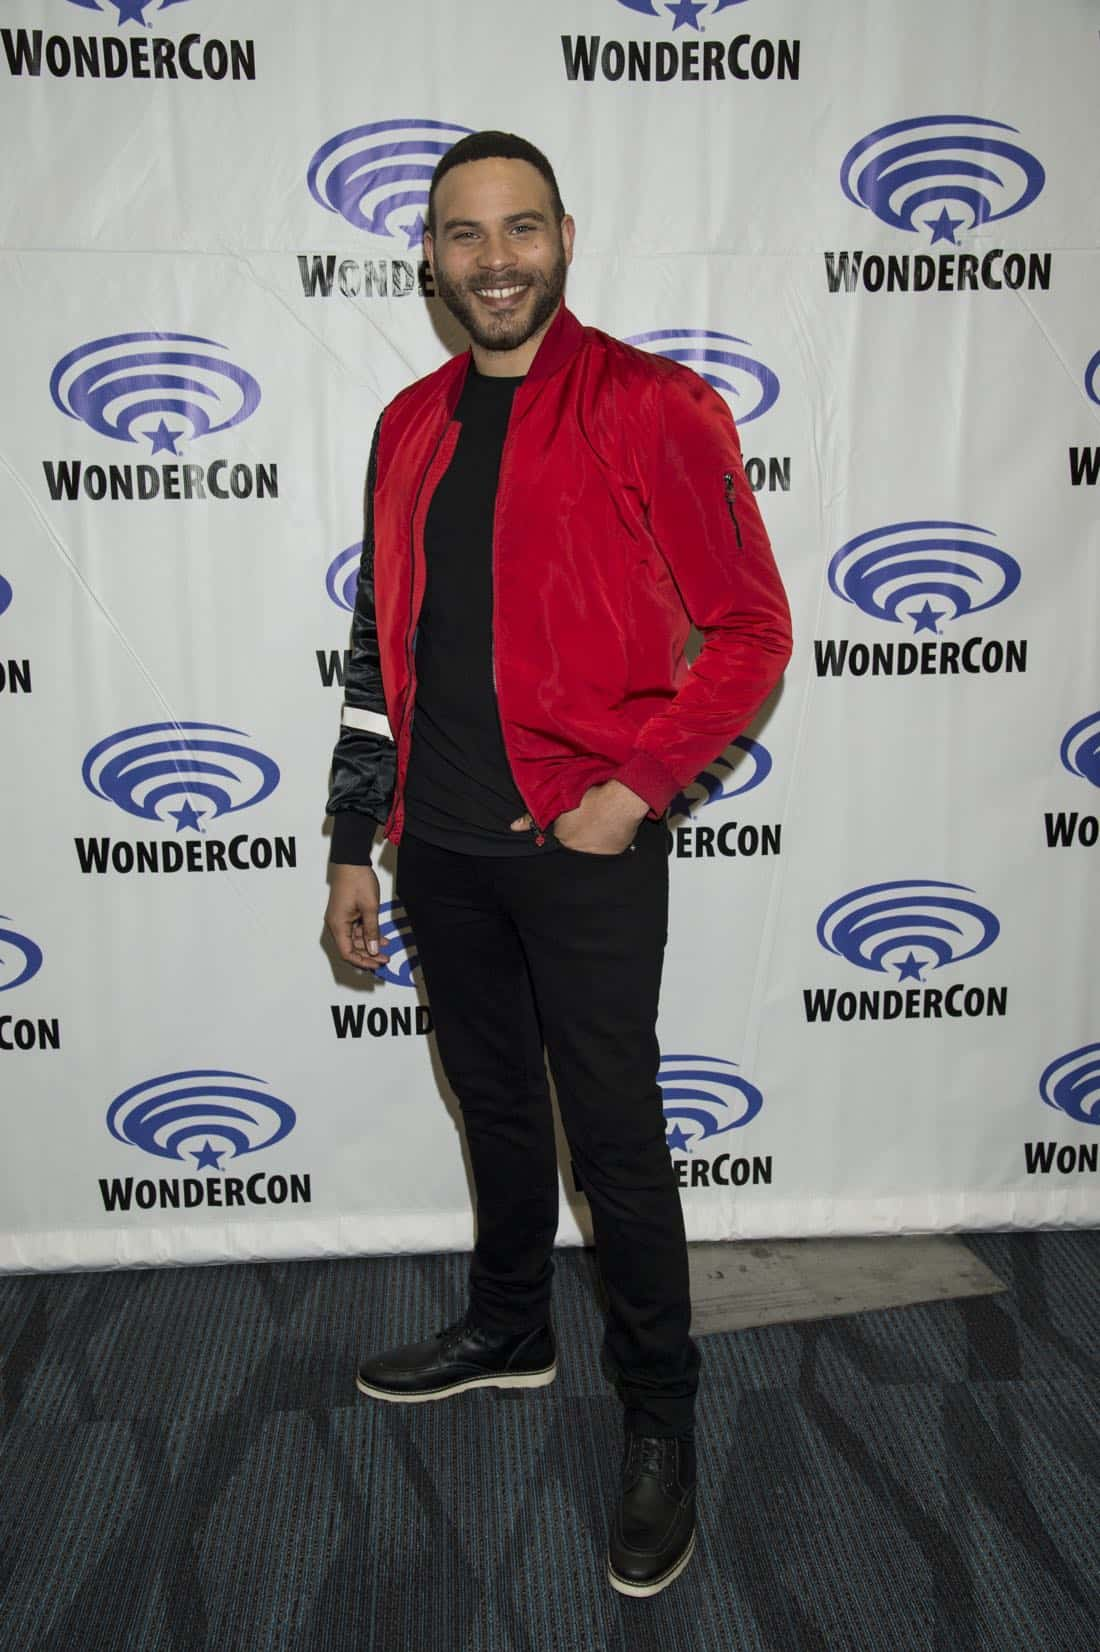 Siren Cast Wondercon 2018 29